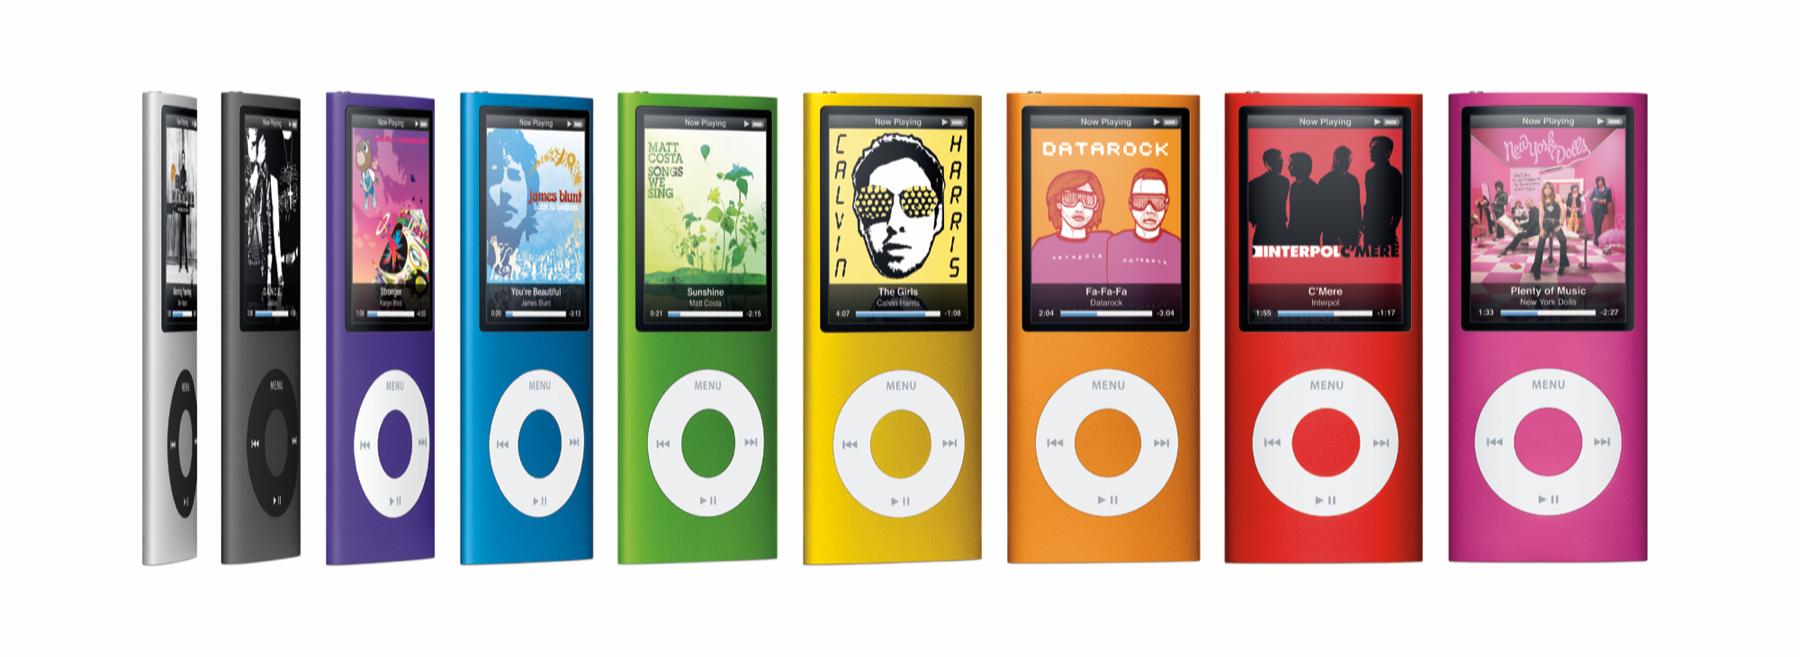 4th-generation iPod nano